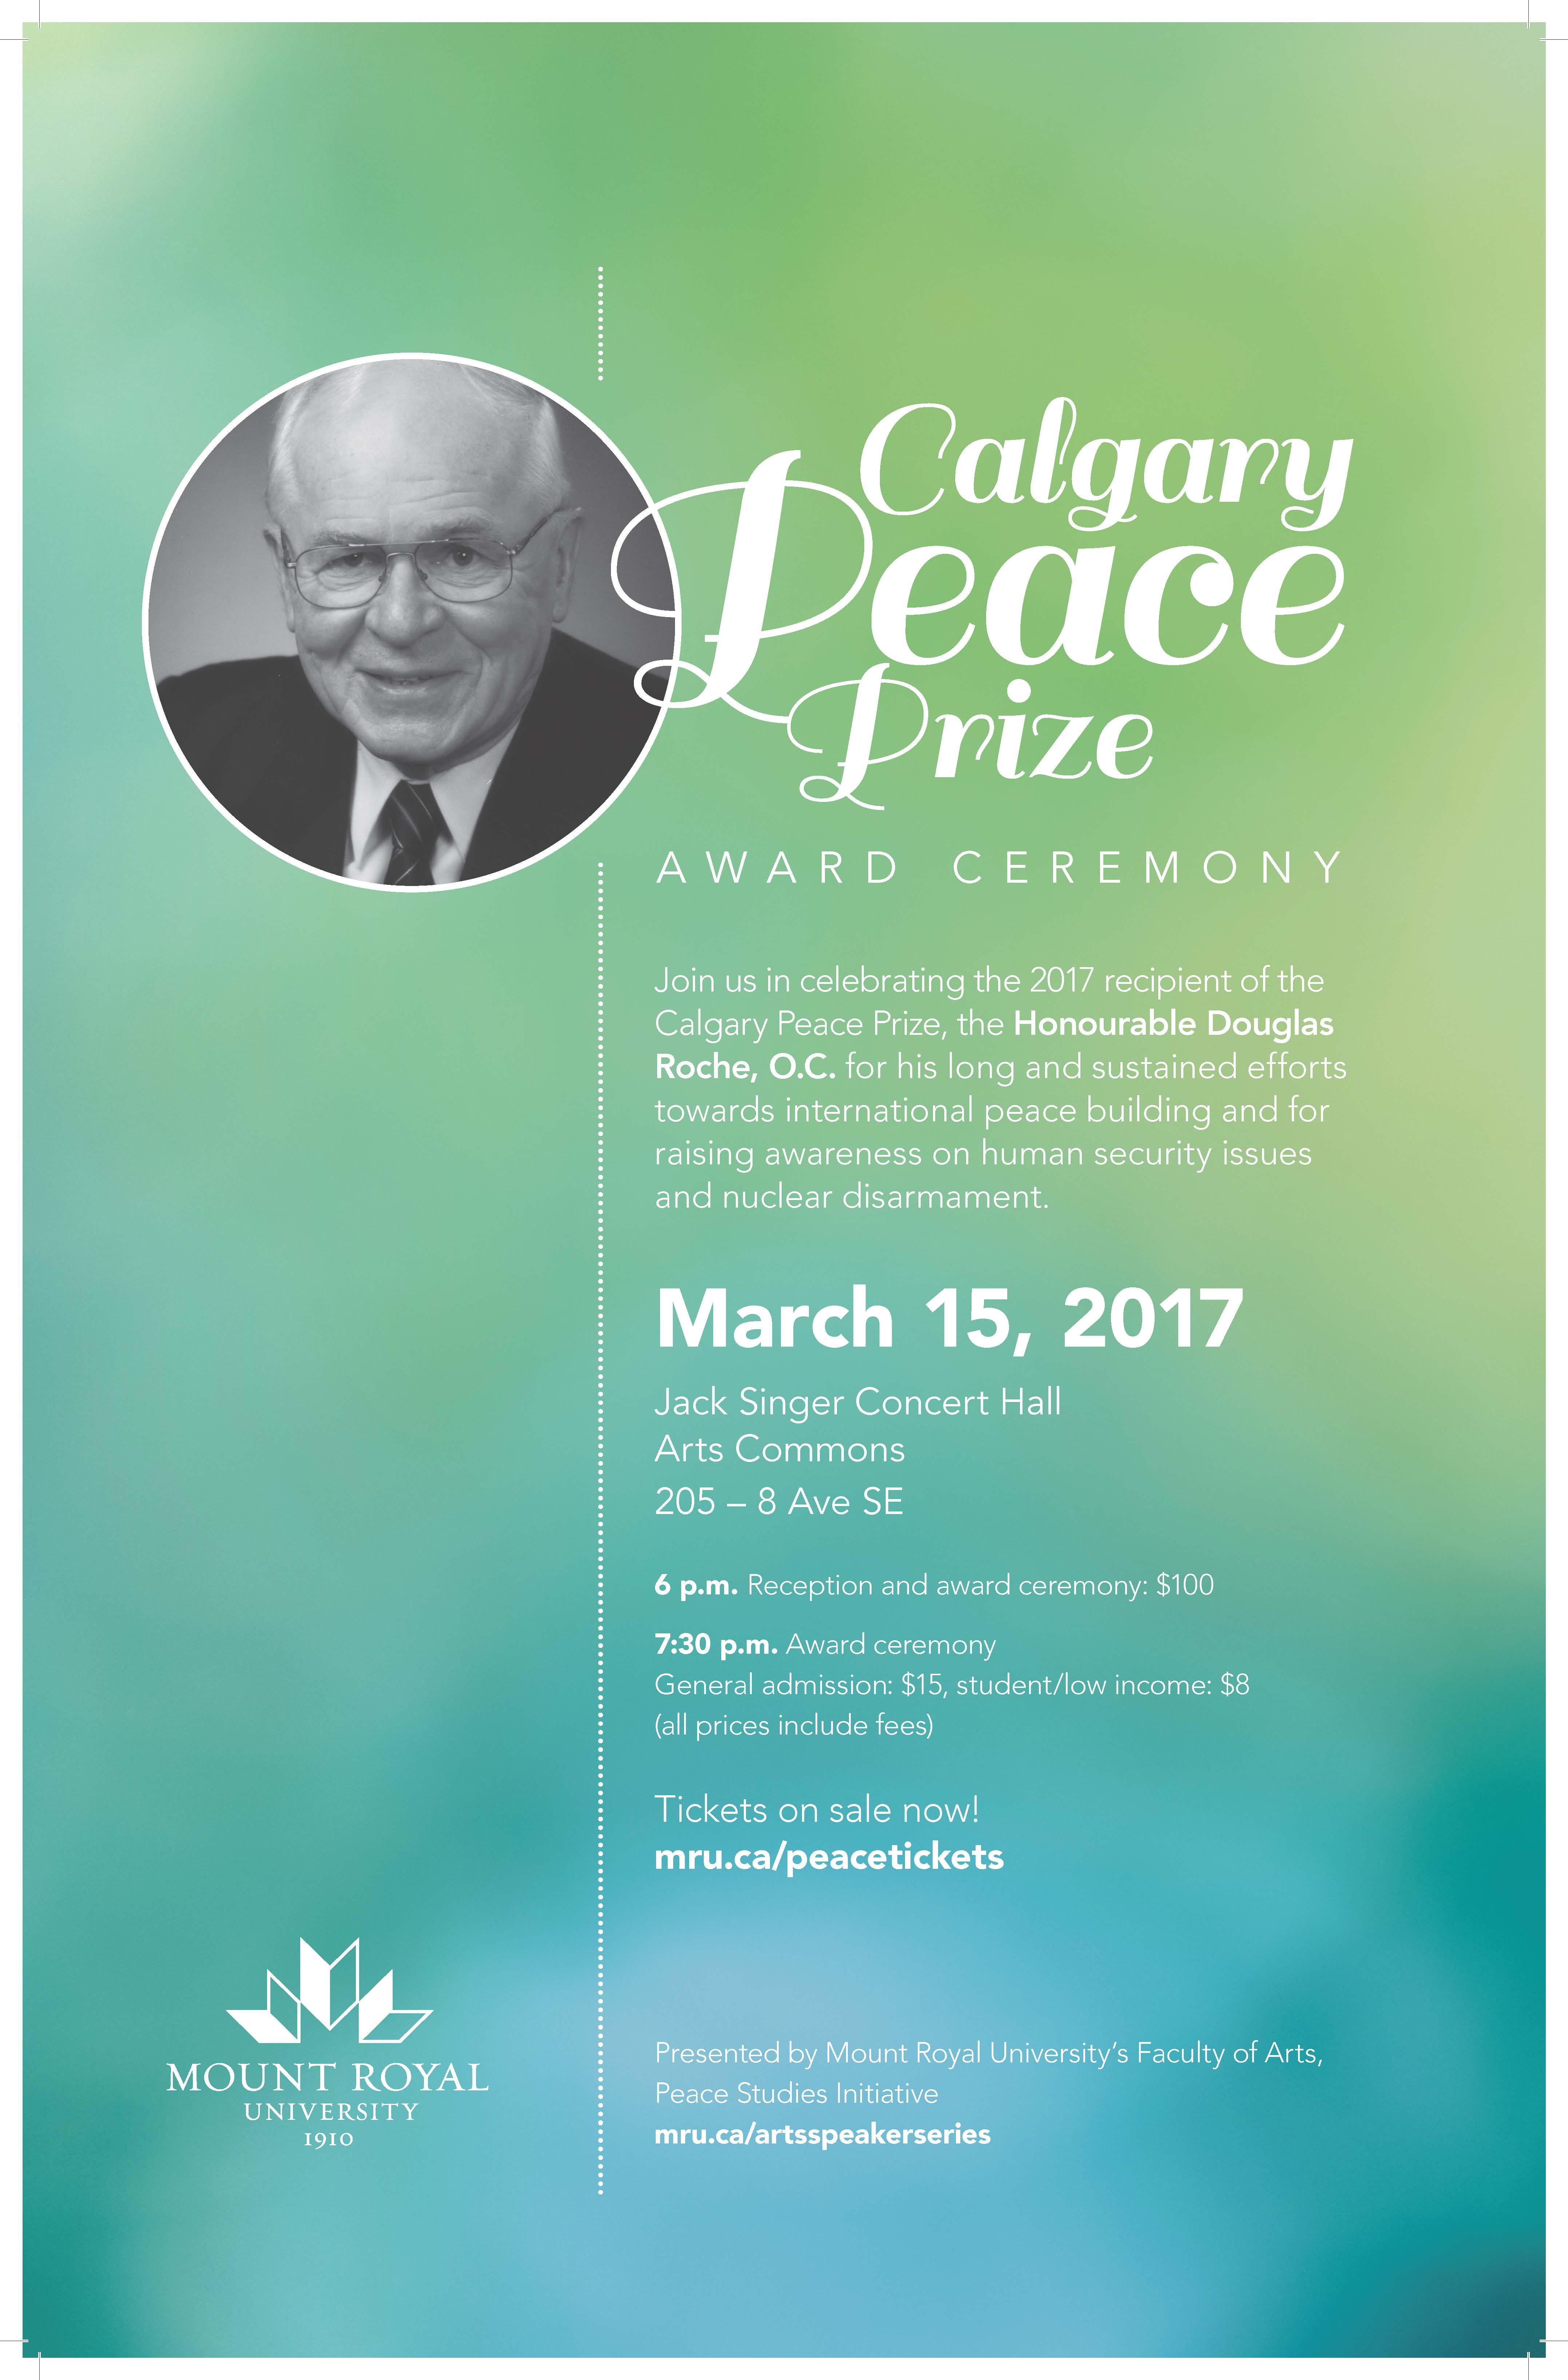 ARTS-07-Calgary_Peace_Prize-11x17.jpg